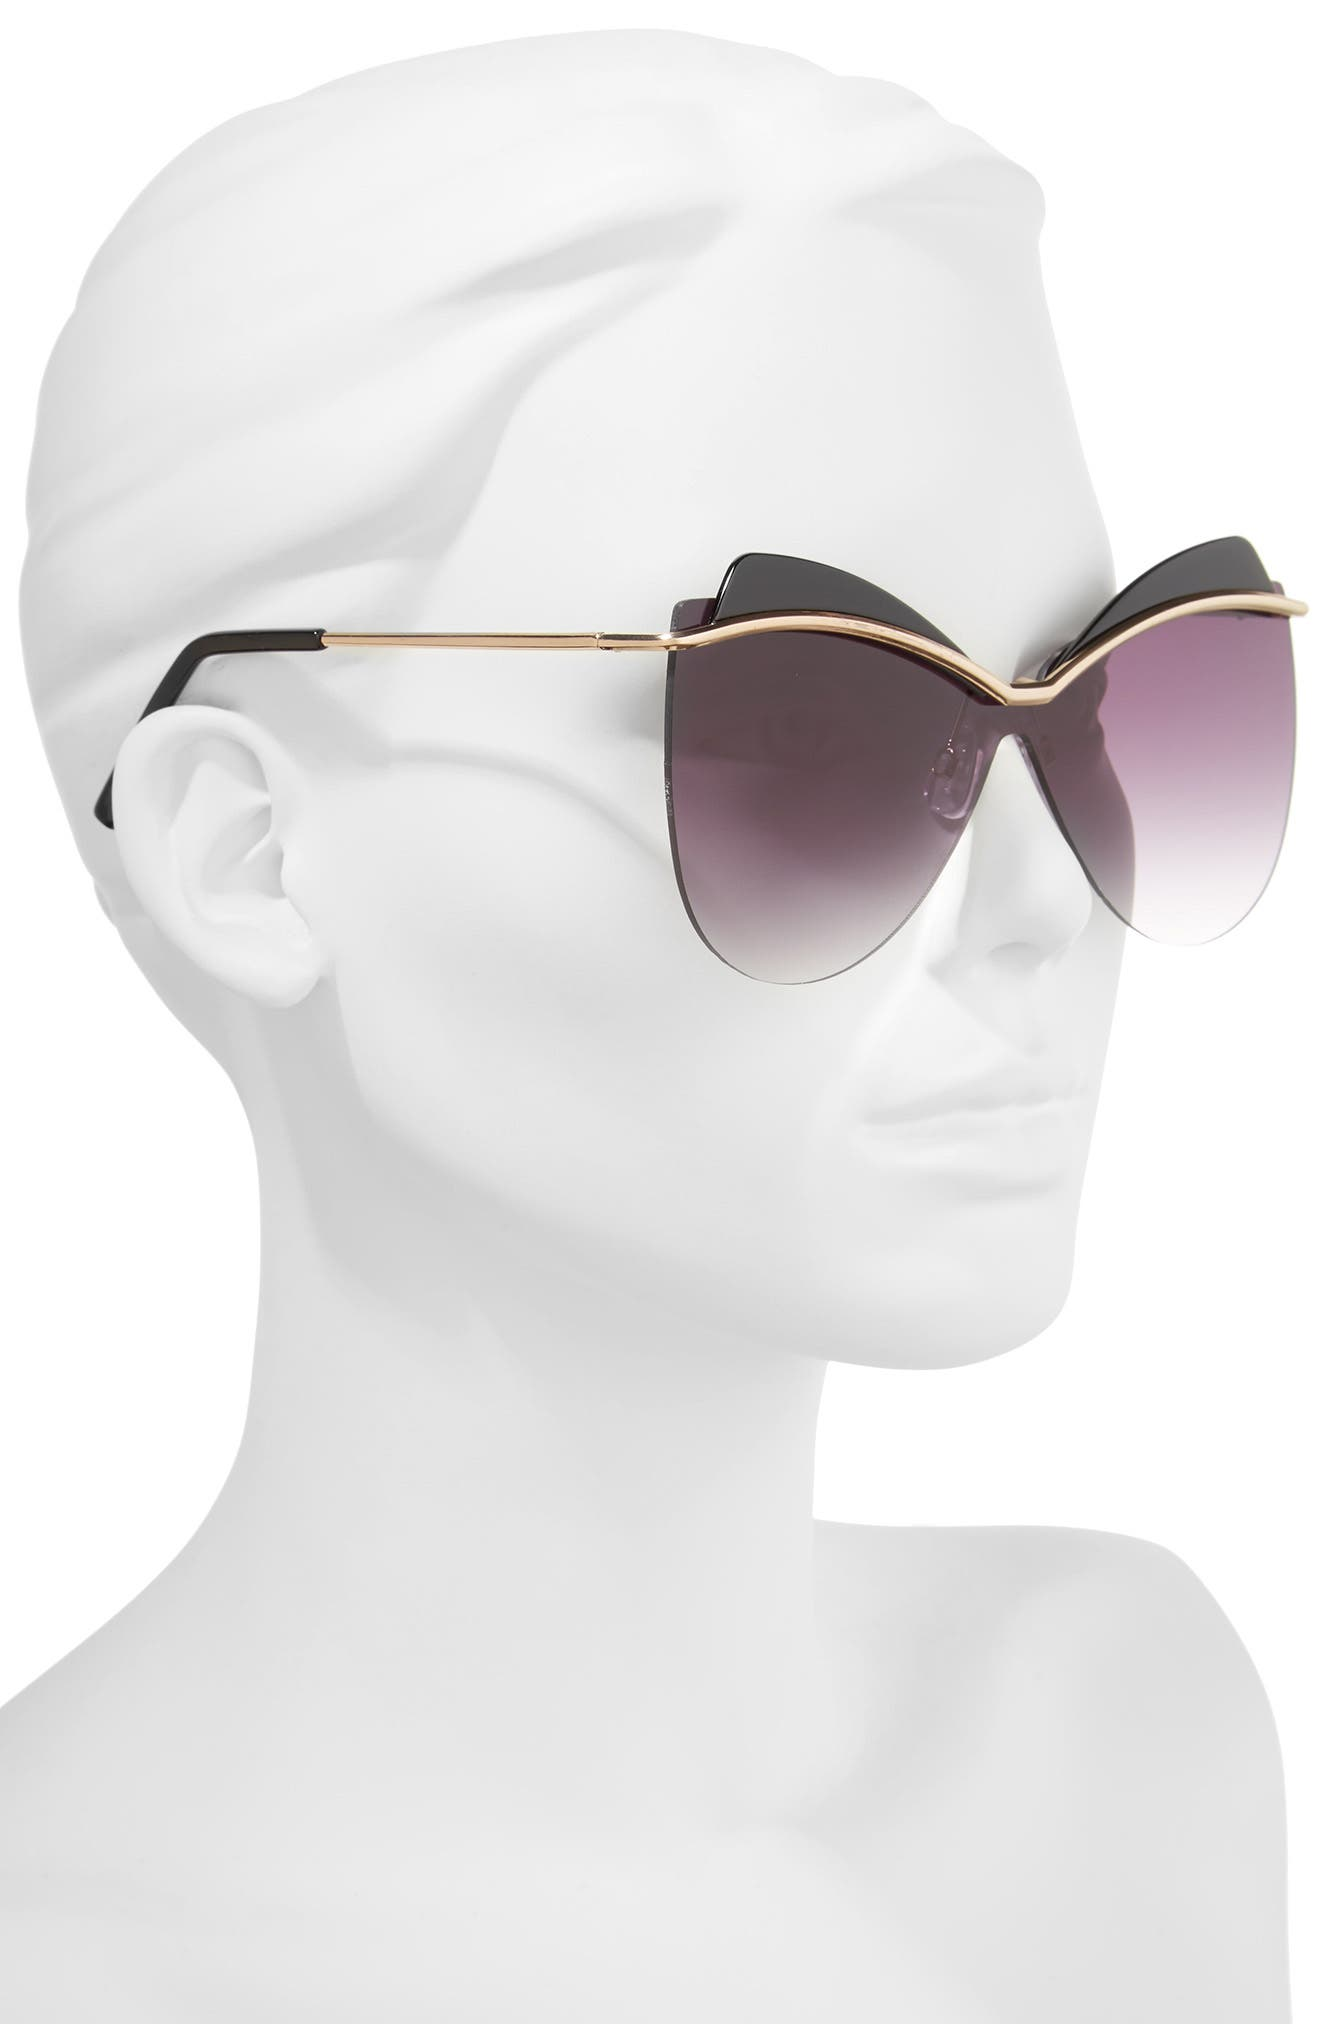 65mm Rimless Shield Sunglasses,                             Alternate thumbnail 2, color,                             Black/ Gold